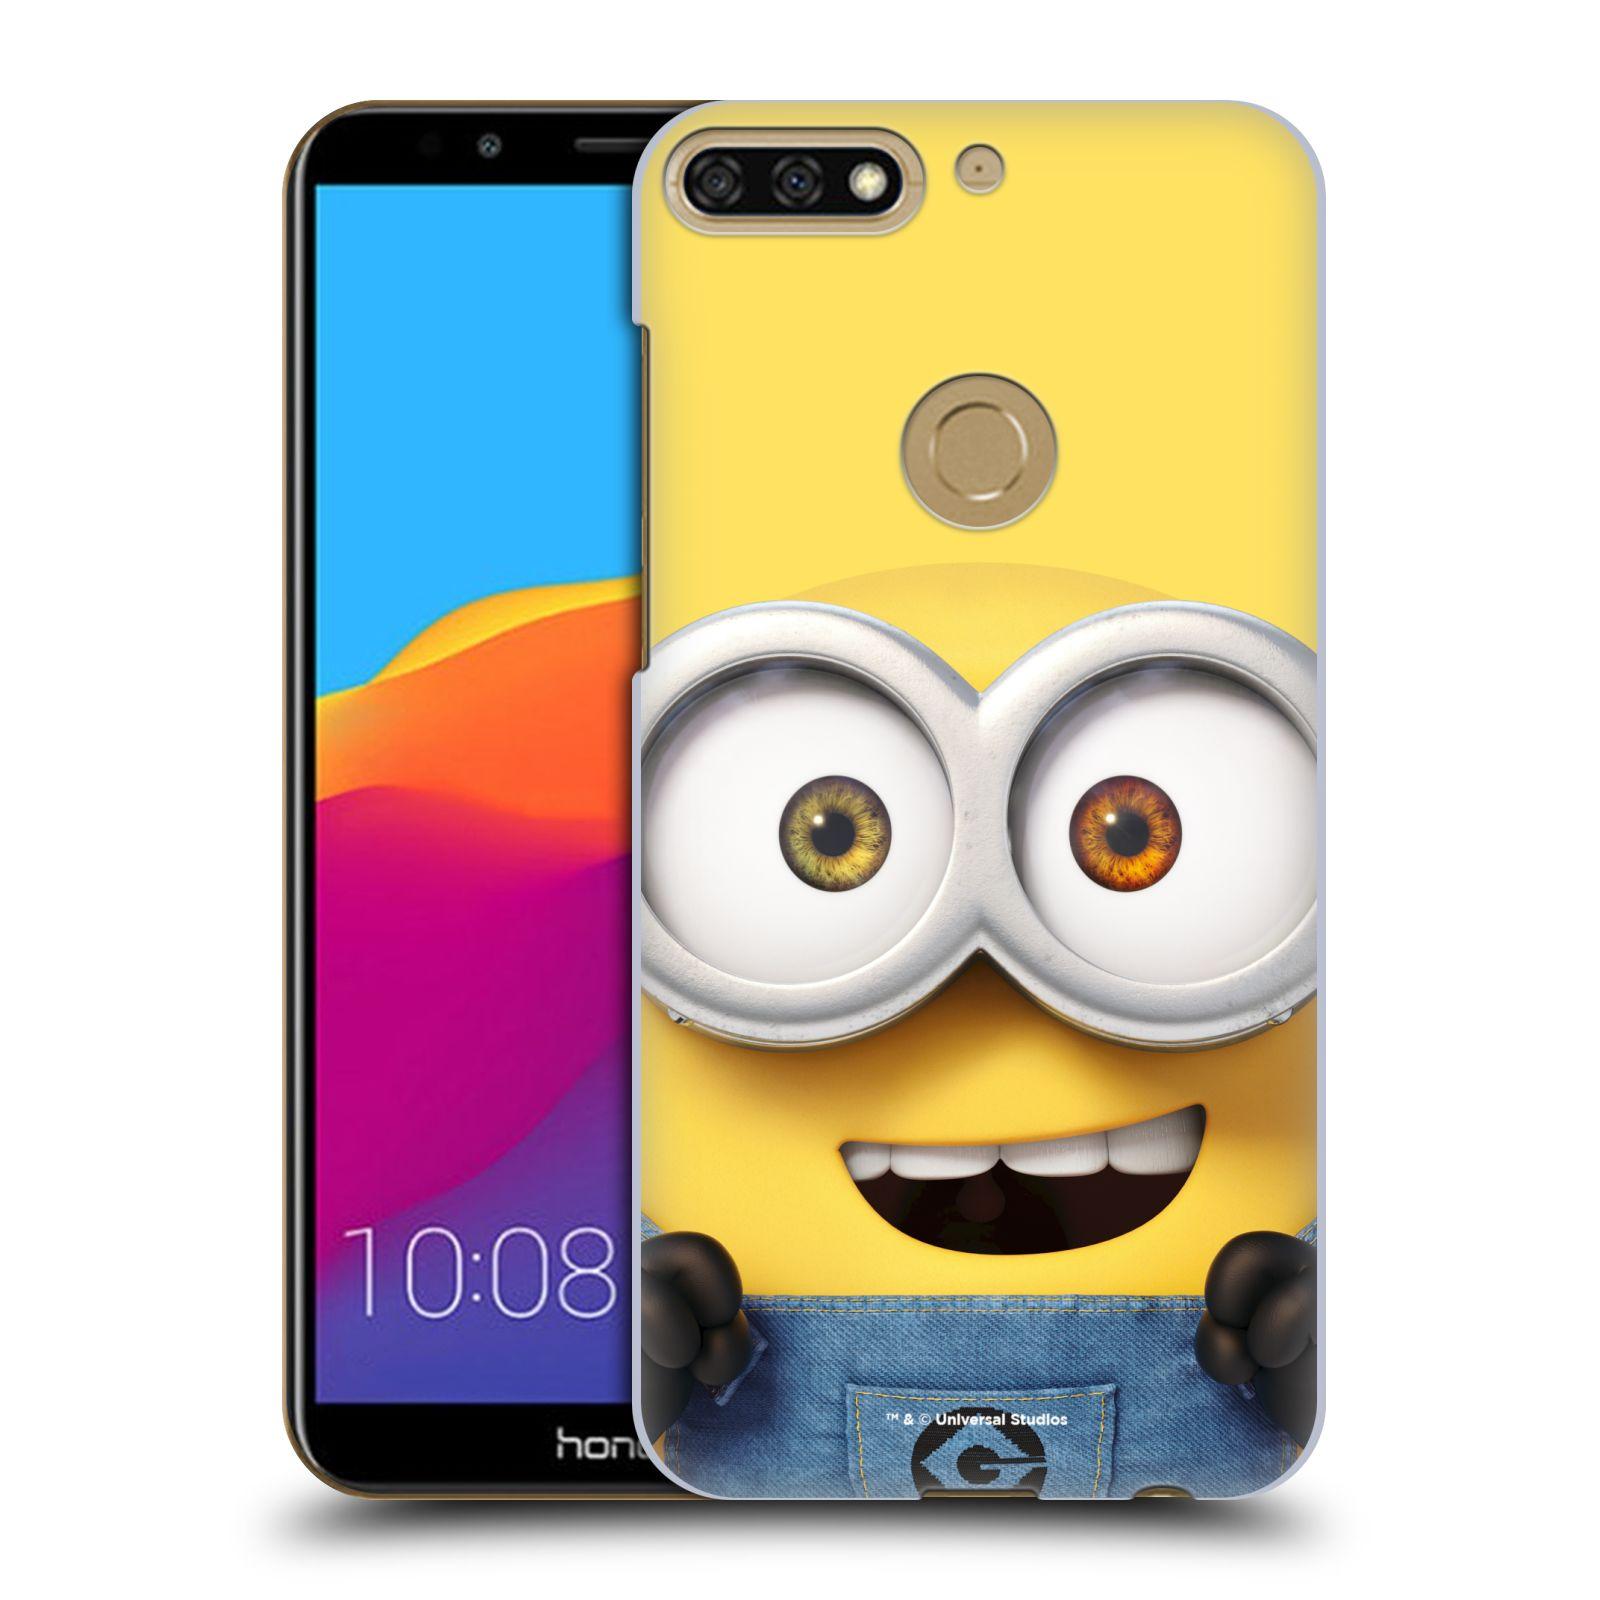 Plastové pouzdro na mobil Huawei Y7 Prime 2018 - Head Case - Mimoň Bob z filmu Já, padouch - Despicable Me